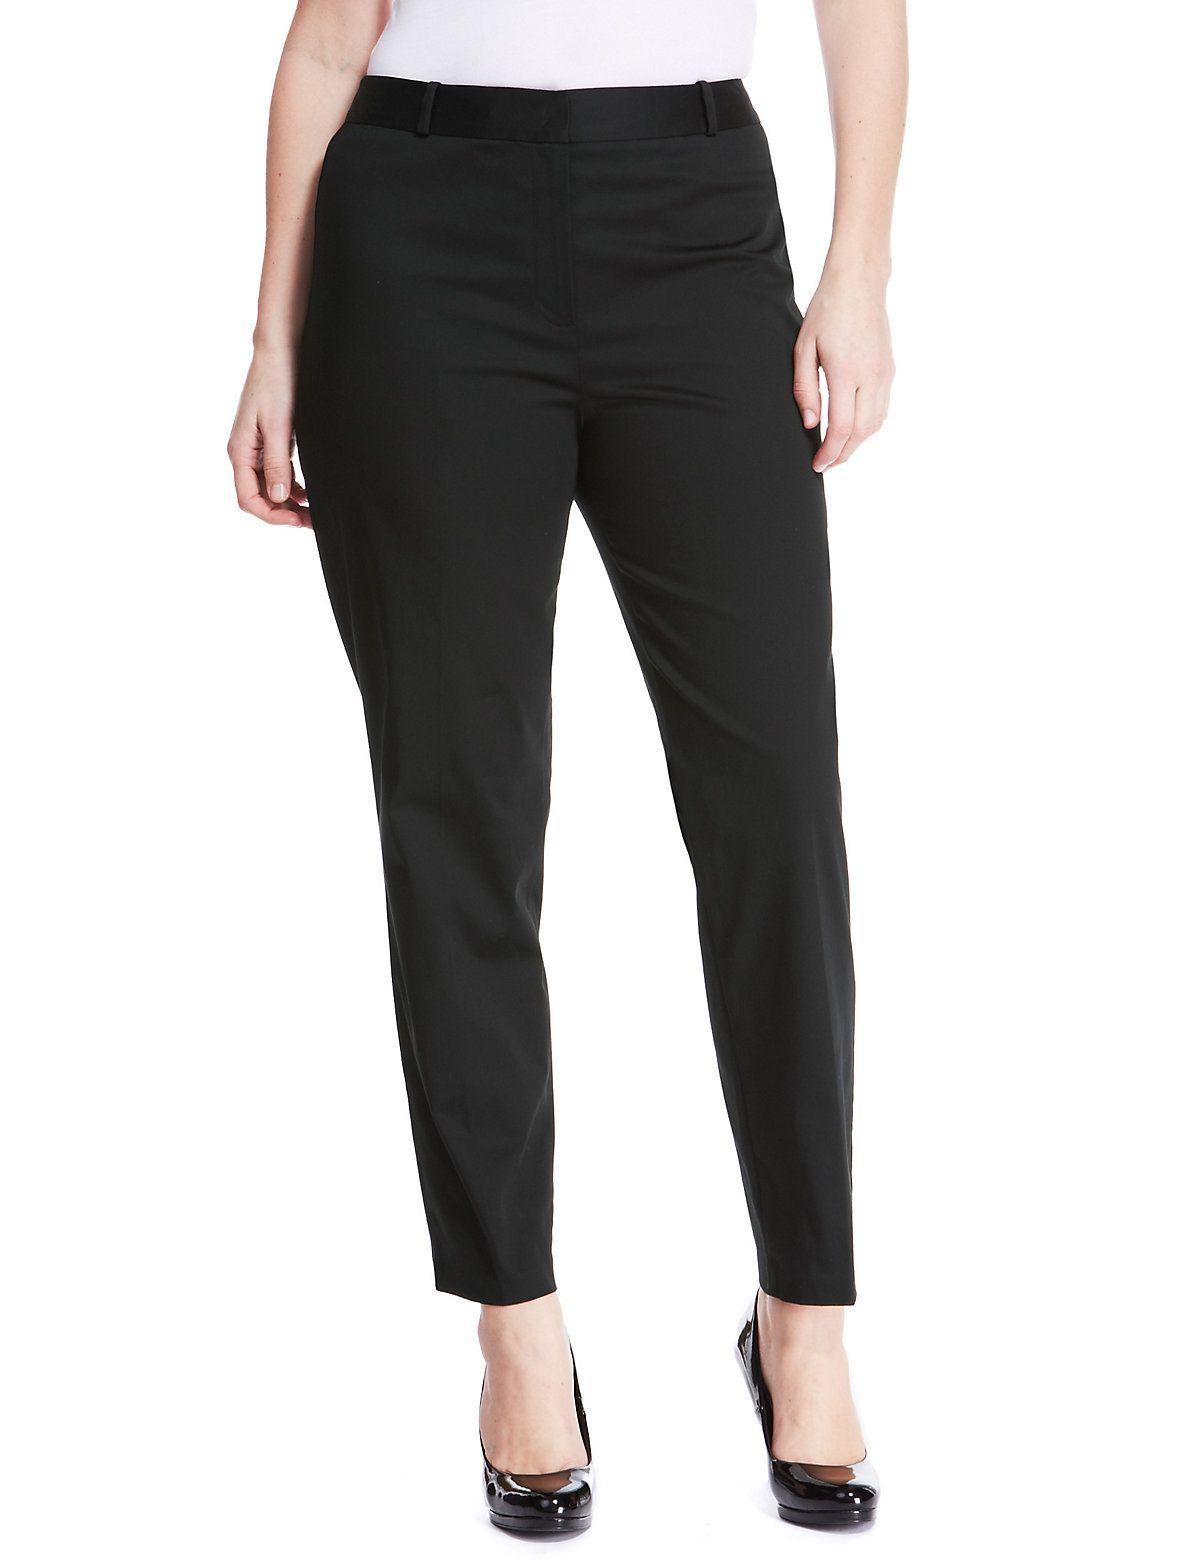 Ropa tallas grandes - Pantalón negro en Marks and Spencer